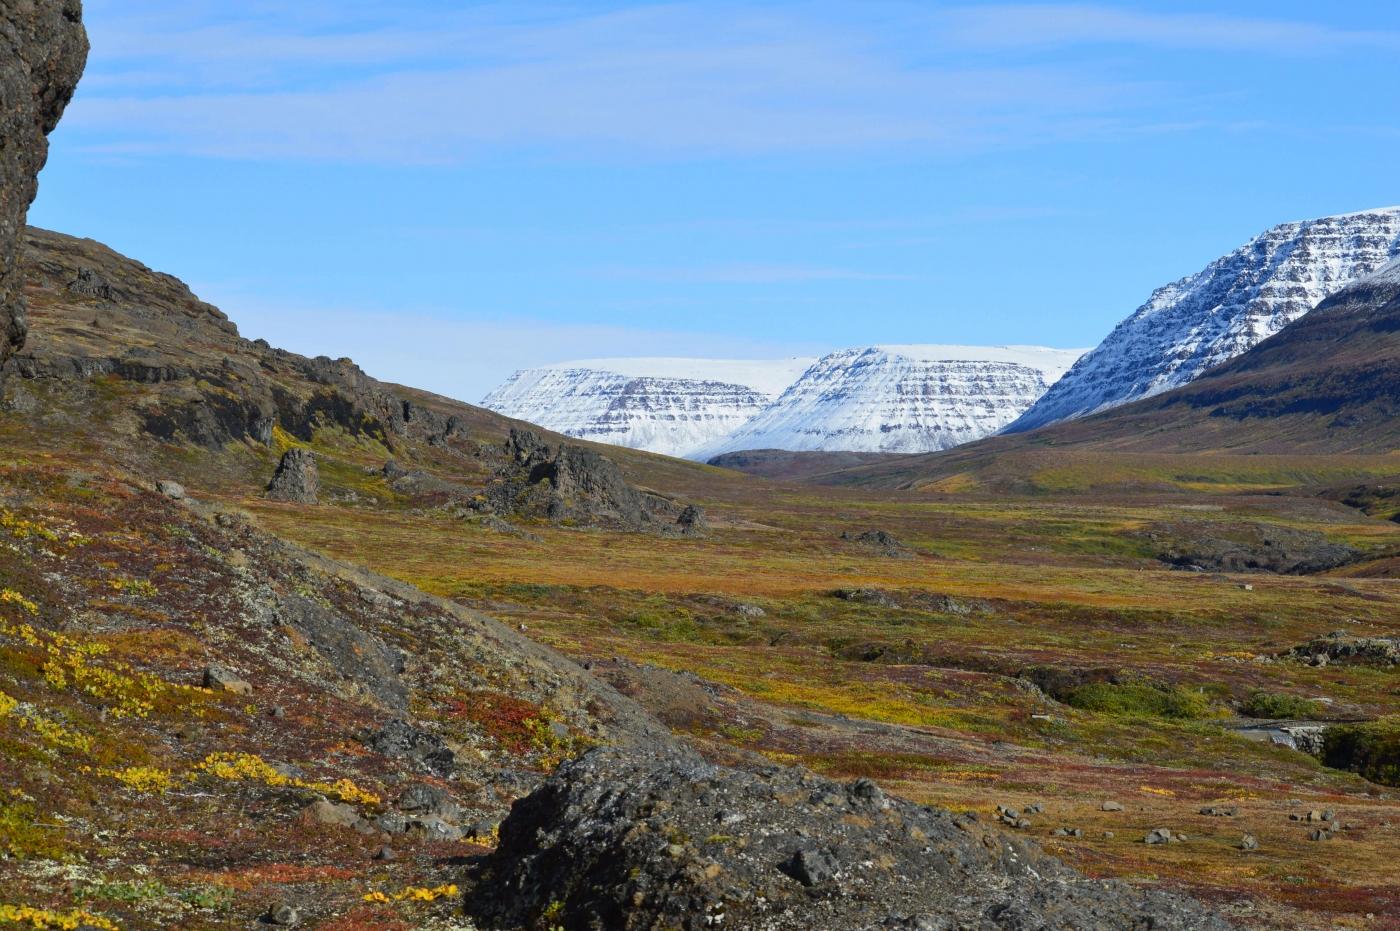 Beautiful, serene landscape near Qeqertarsuaq. Photo by Skansen – Your Home, Visit Greenland